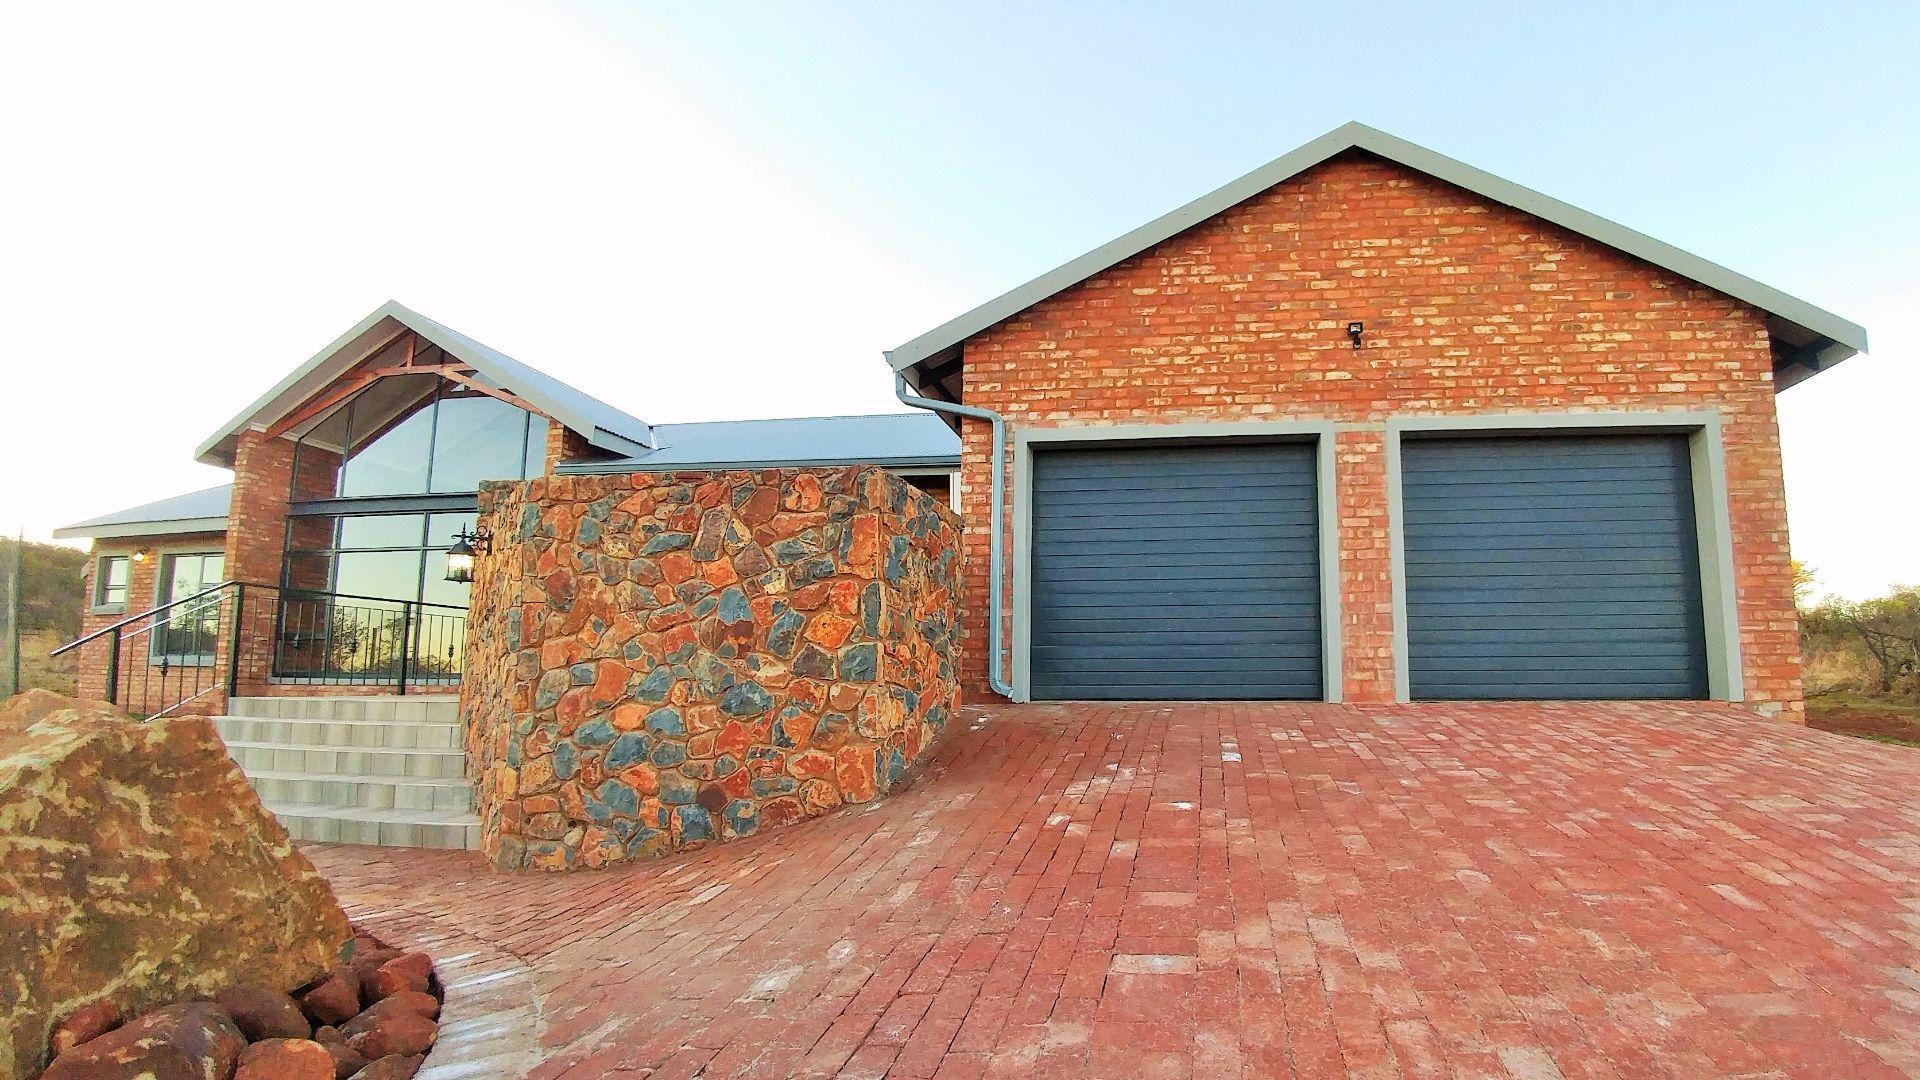 Potchefstroom, Lekwena Wildlife Estate Property  | Houses For Sale Lekwena Wildlife Estate, LEKWENA WILDLIFE ESTATE, House 3 bedrooms property for sale Price:3,450,000